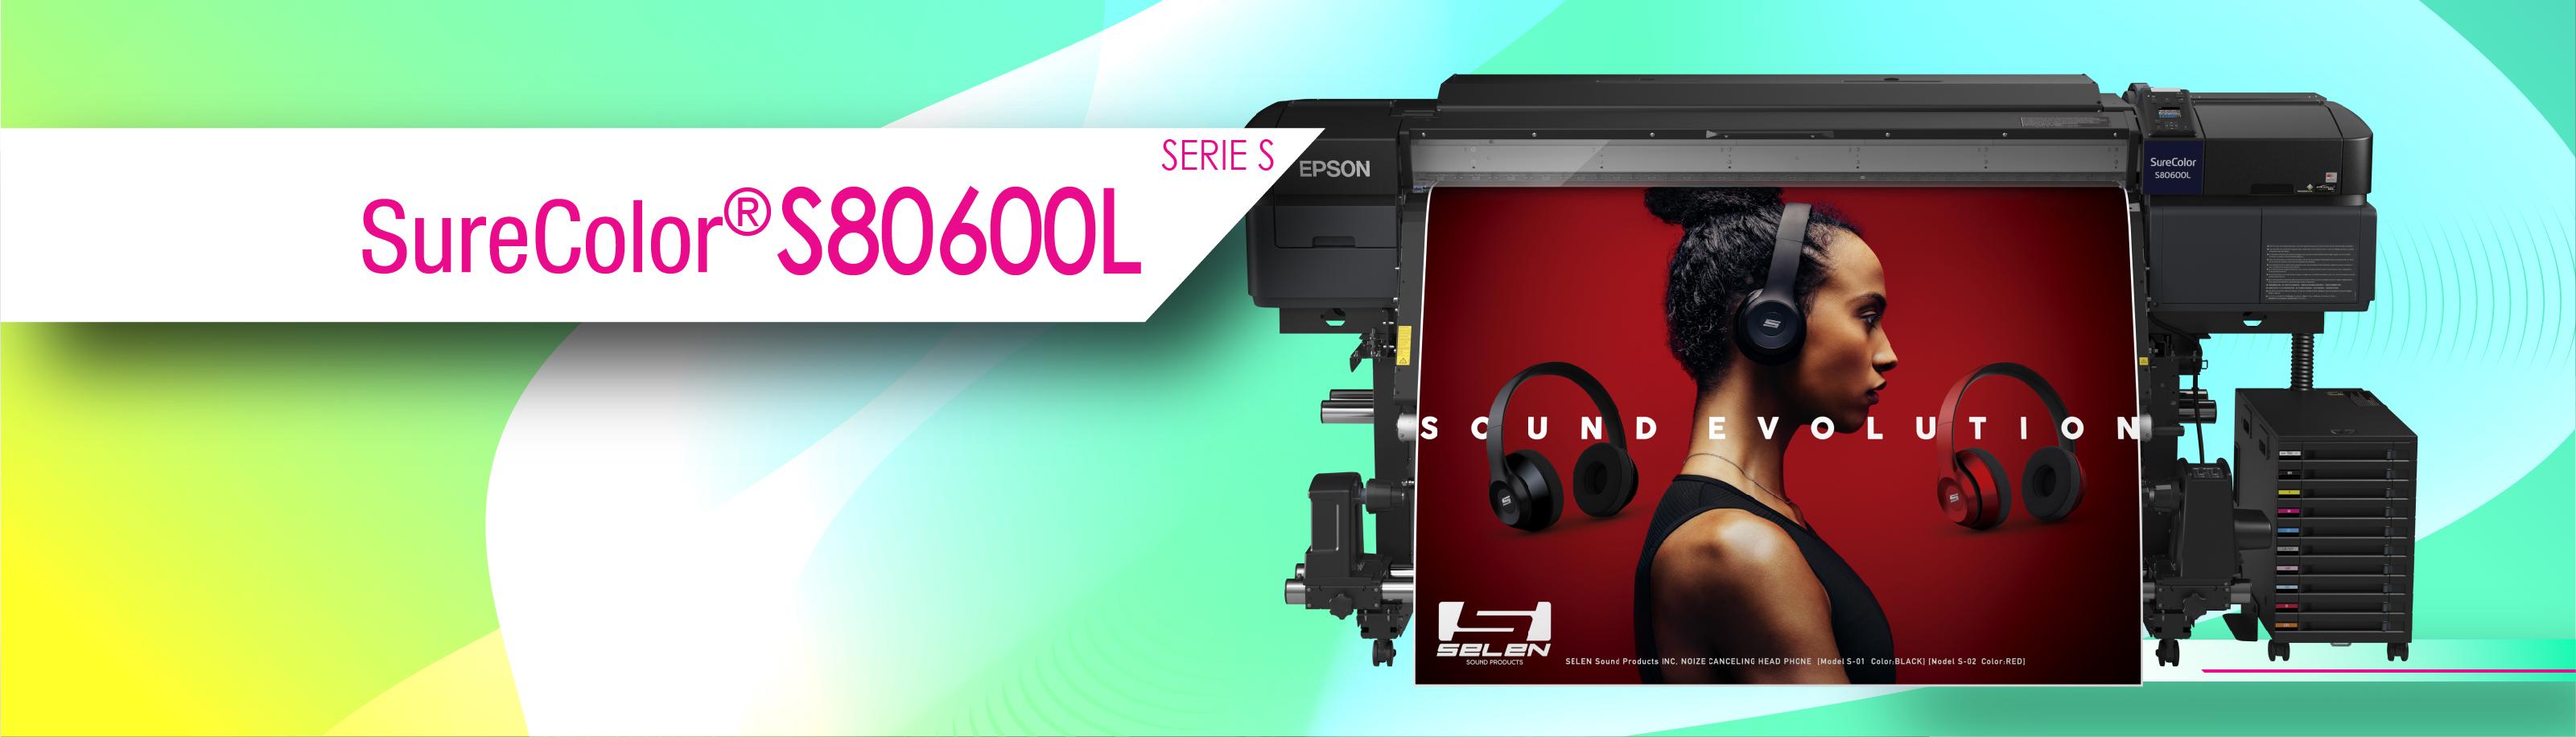 S80600L BANNER